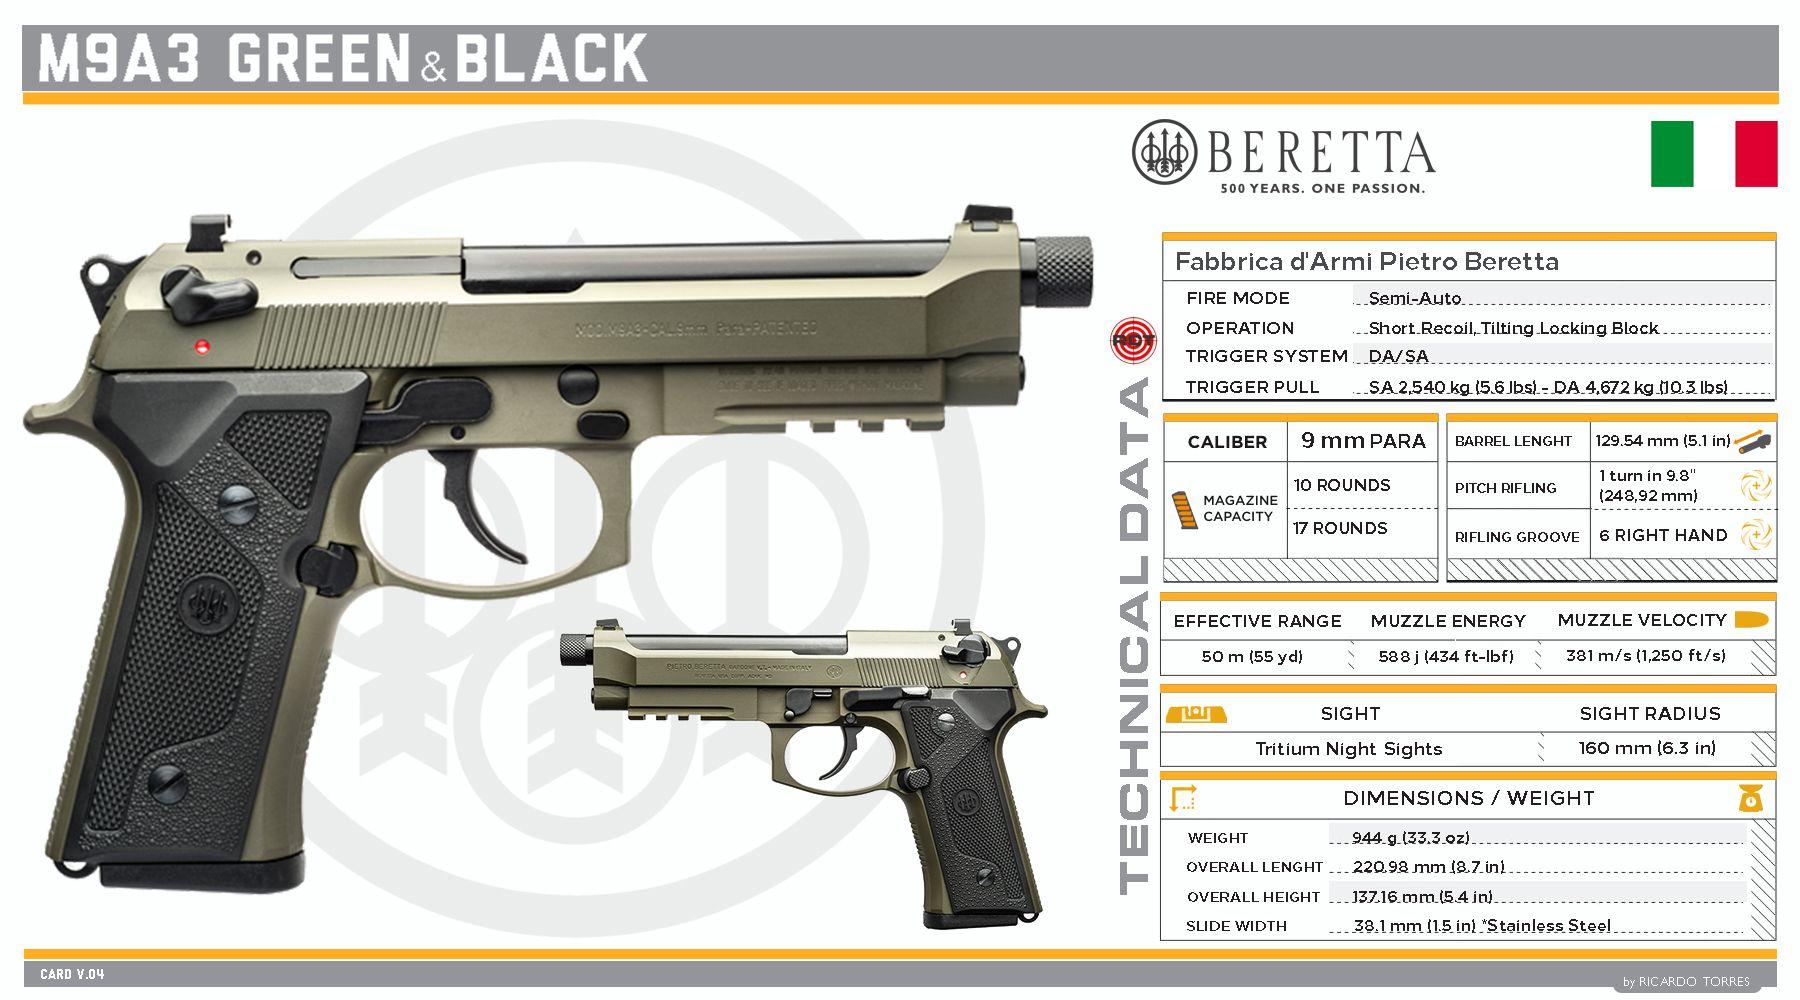 Fabbrica d'Armi Pietro Beretta - M9A3 Green & Black   gun